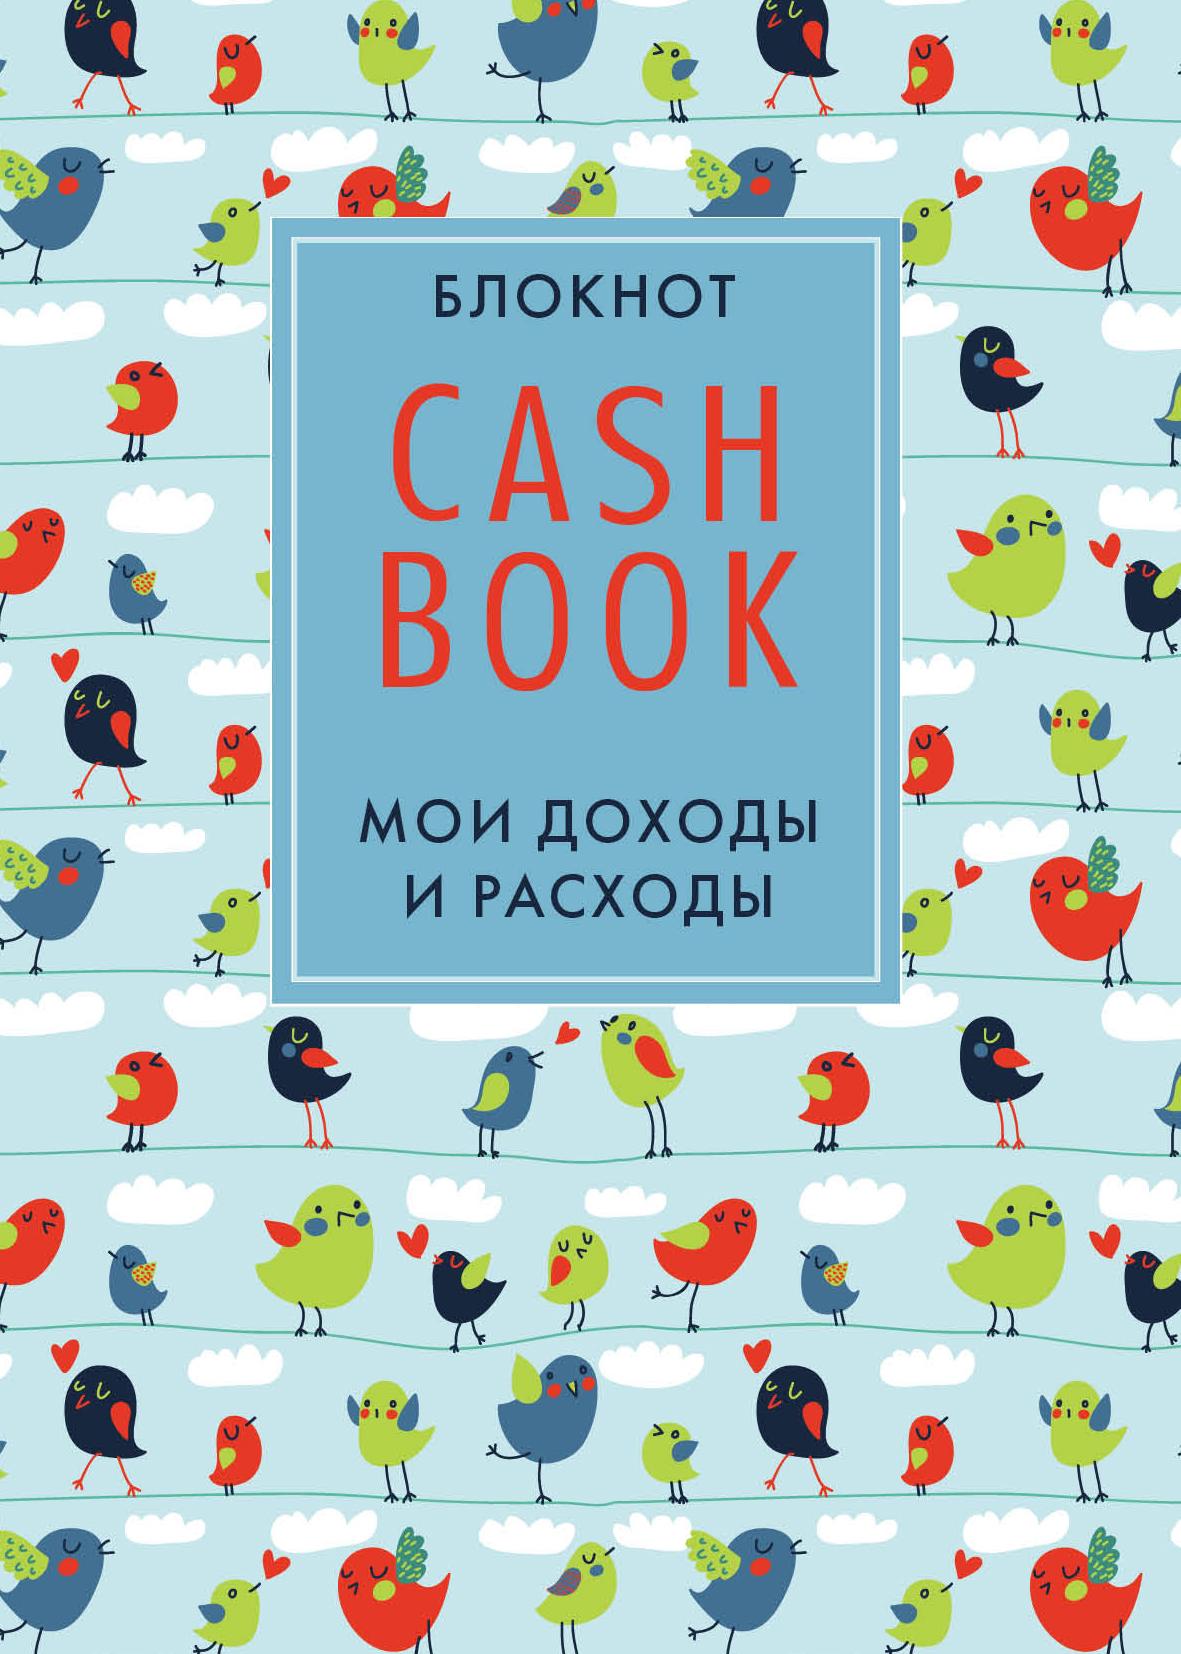 CashBook. Мои доходы и расходы. 3-е издание (5 оформление) cashbook мои доходы и расходы 4 е изд 3 е оф